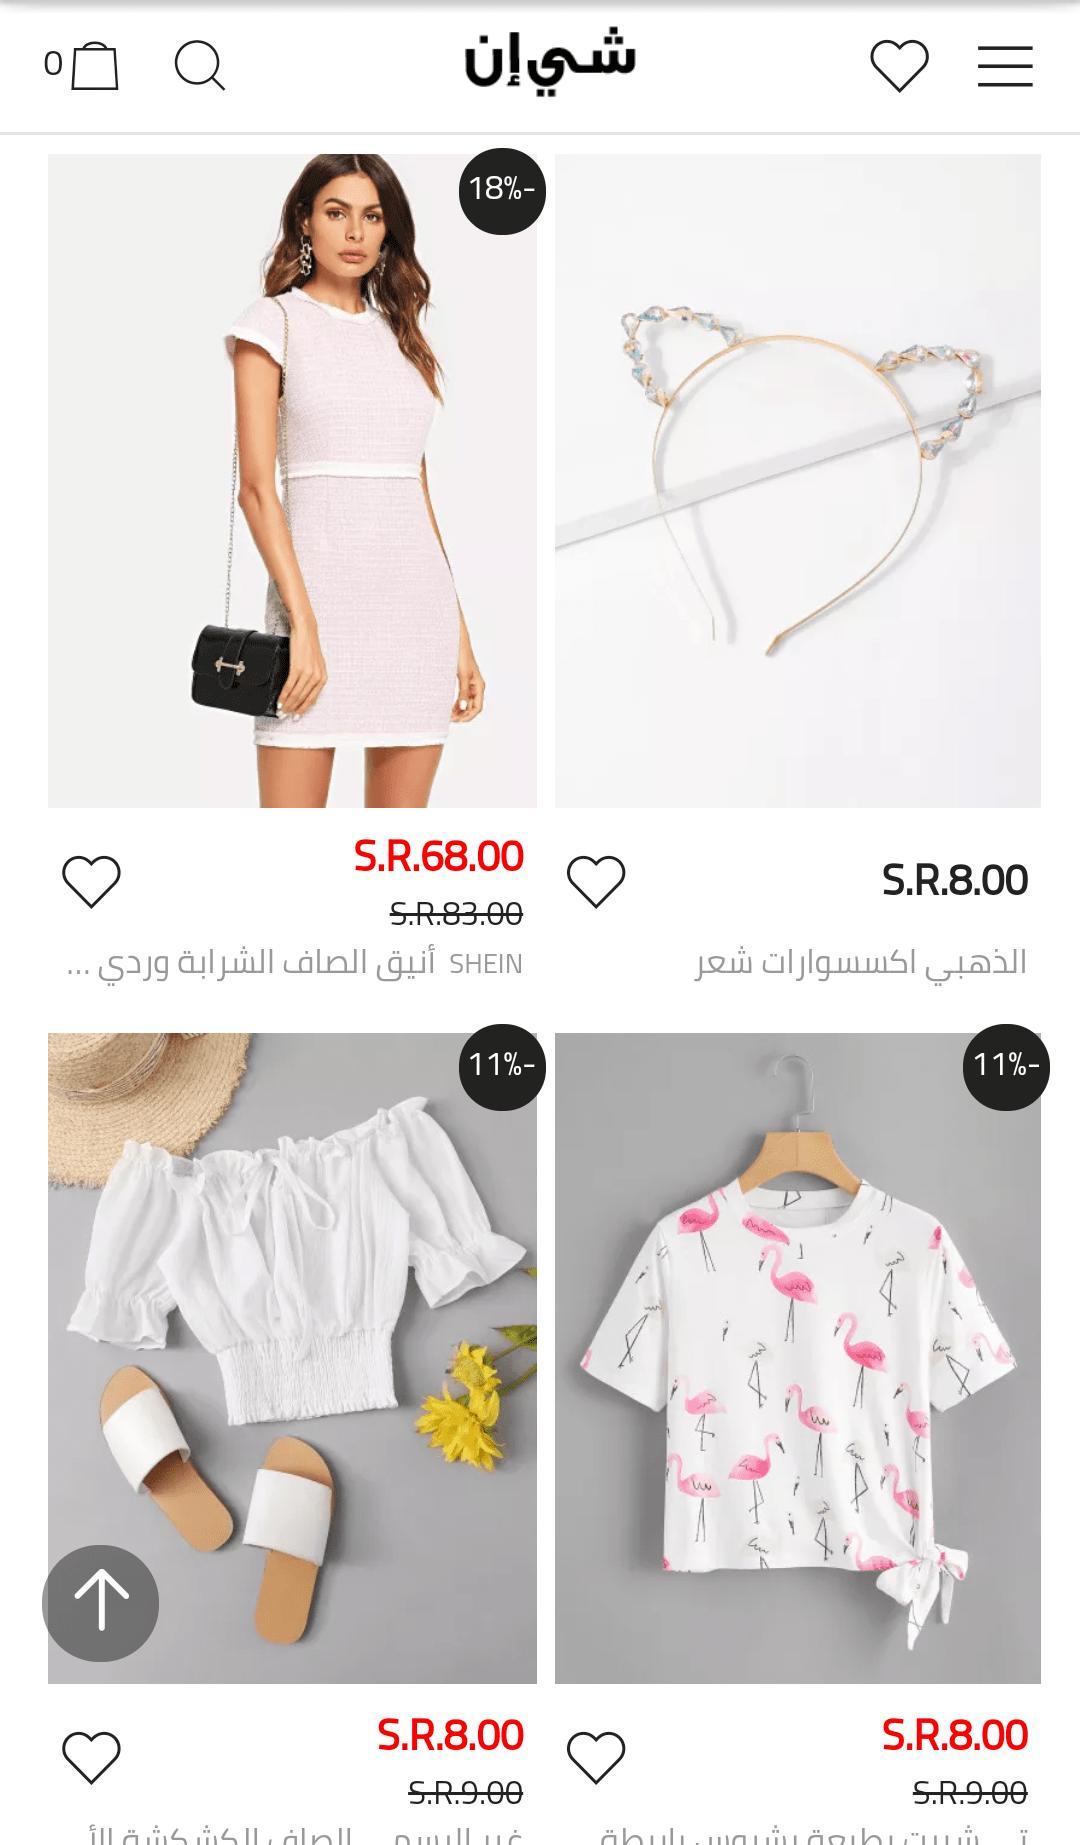 73cb3d004 SheIn-ملابس نسائية أزياء، بلايز، متجر الفساتين for Android - APK ...